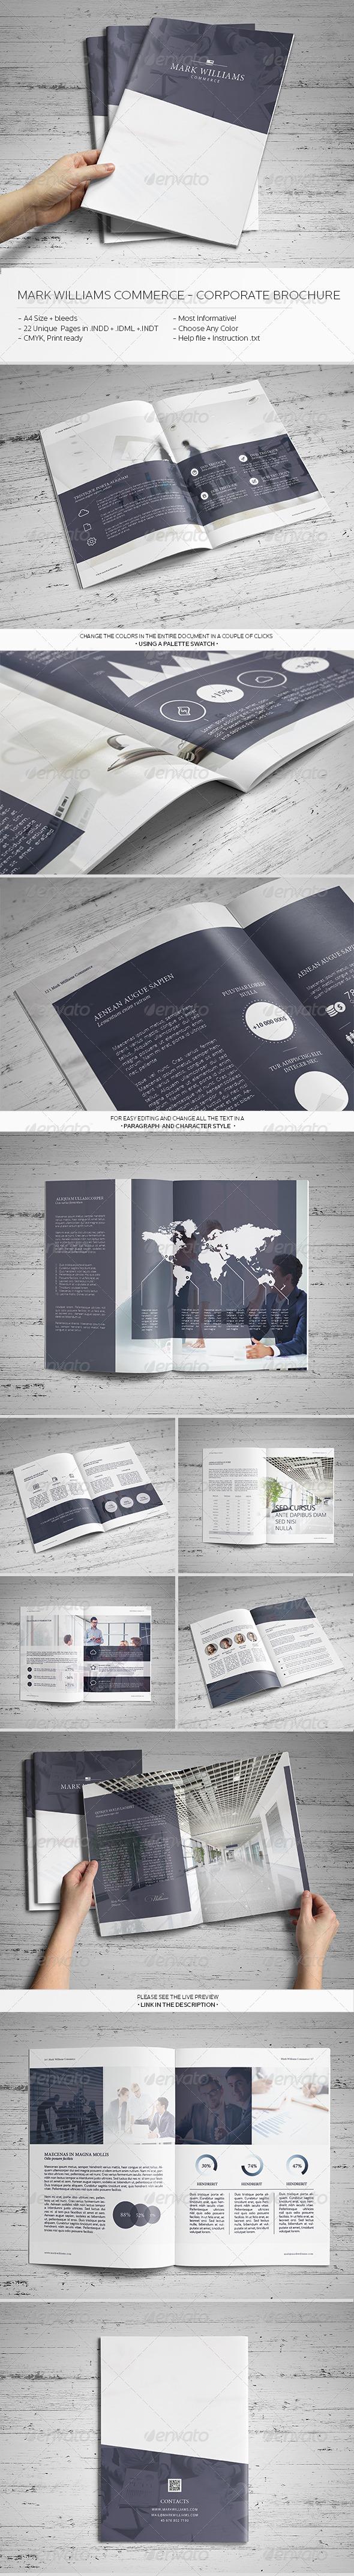 Mark Williams Commerce - Corporate Brochure - Brochures Print Templates